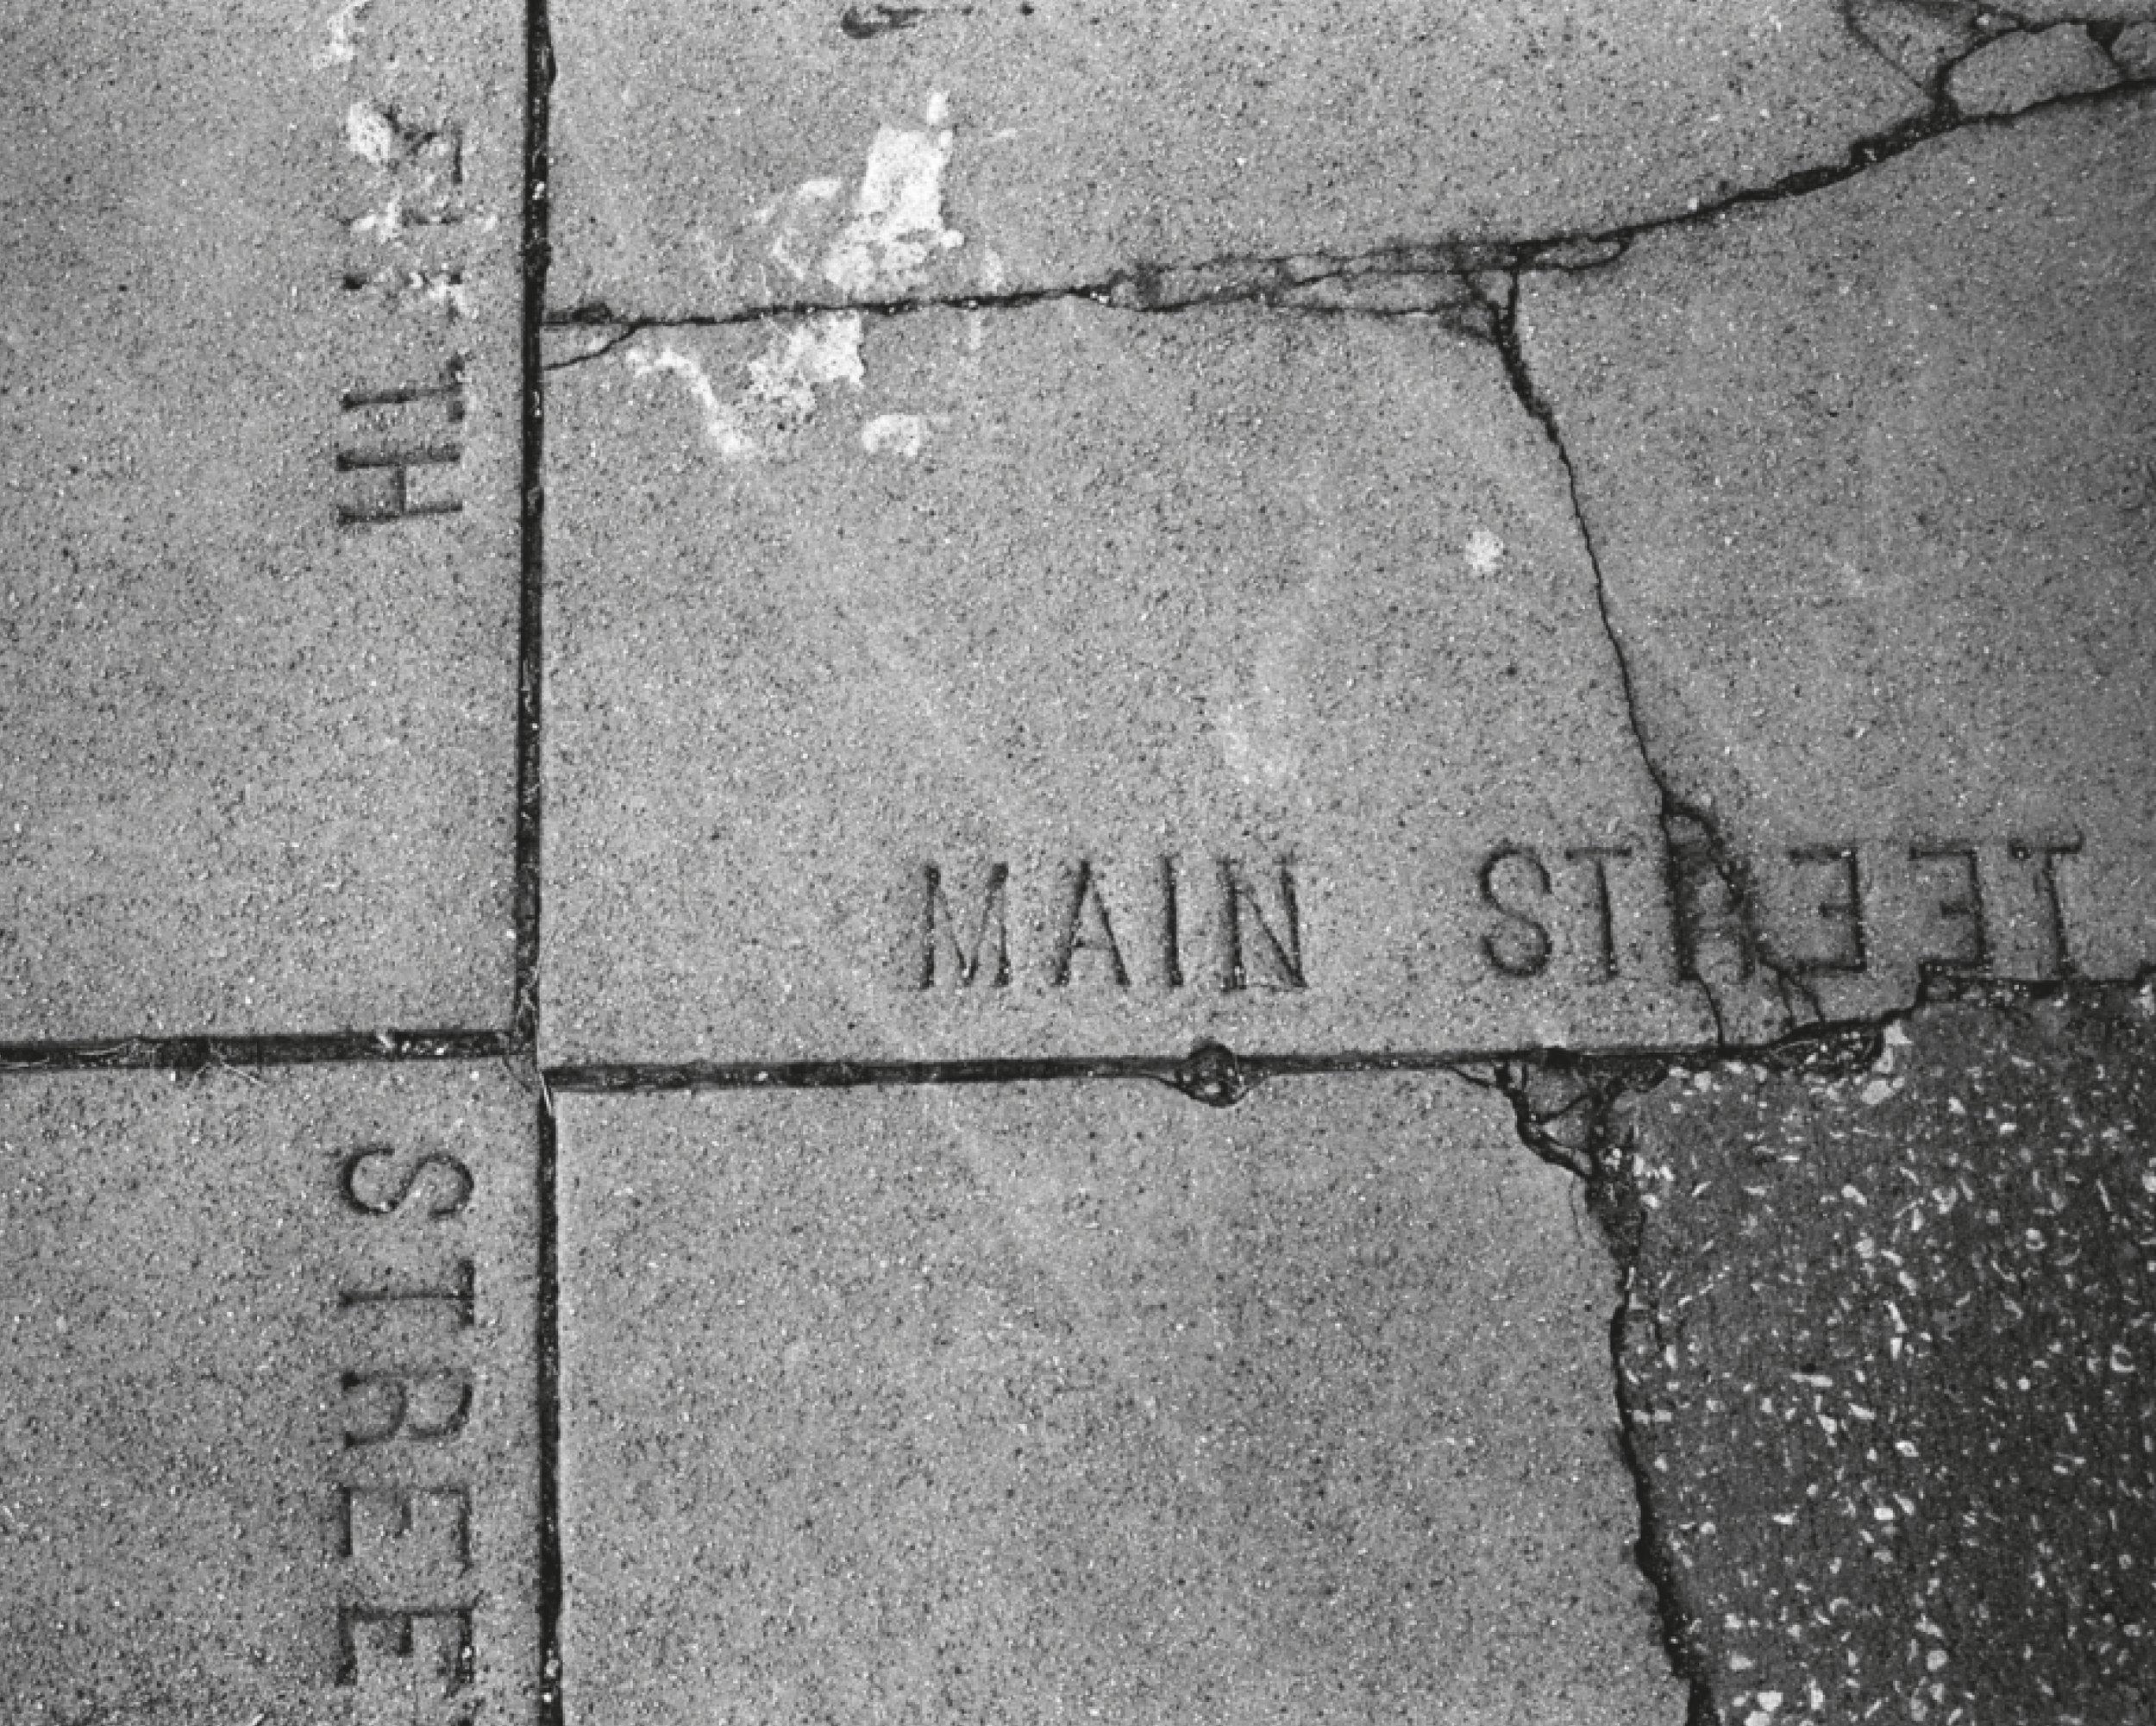 Edward Keating: Main Street